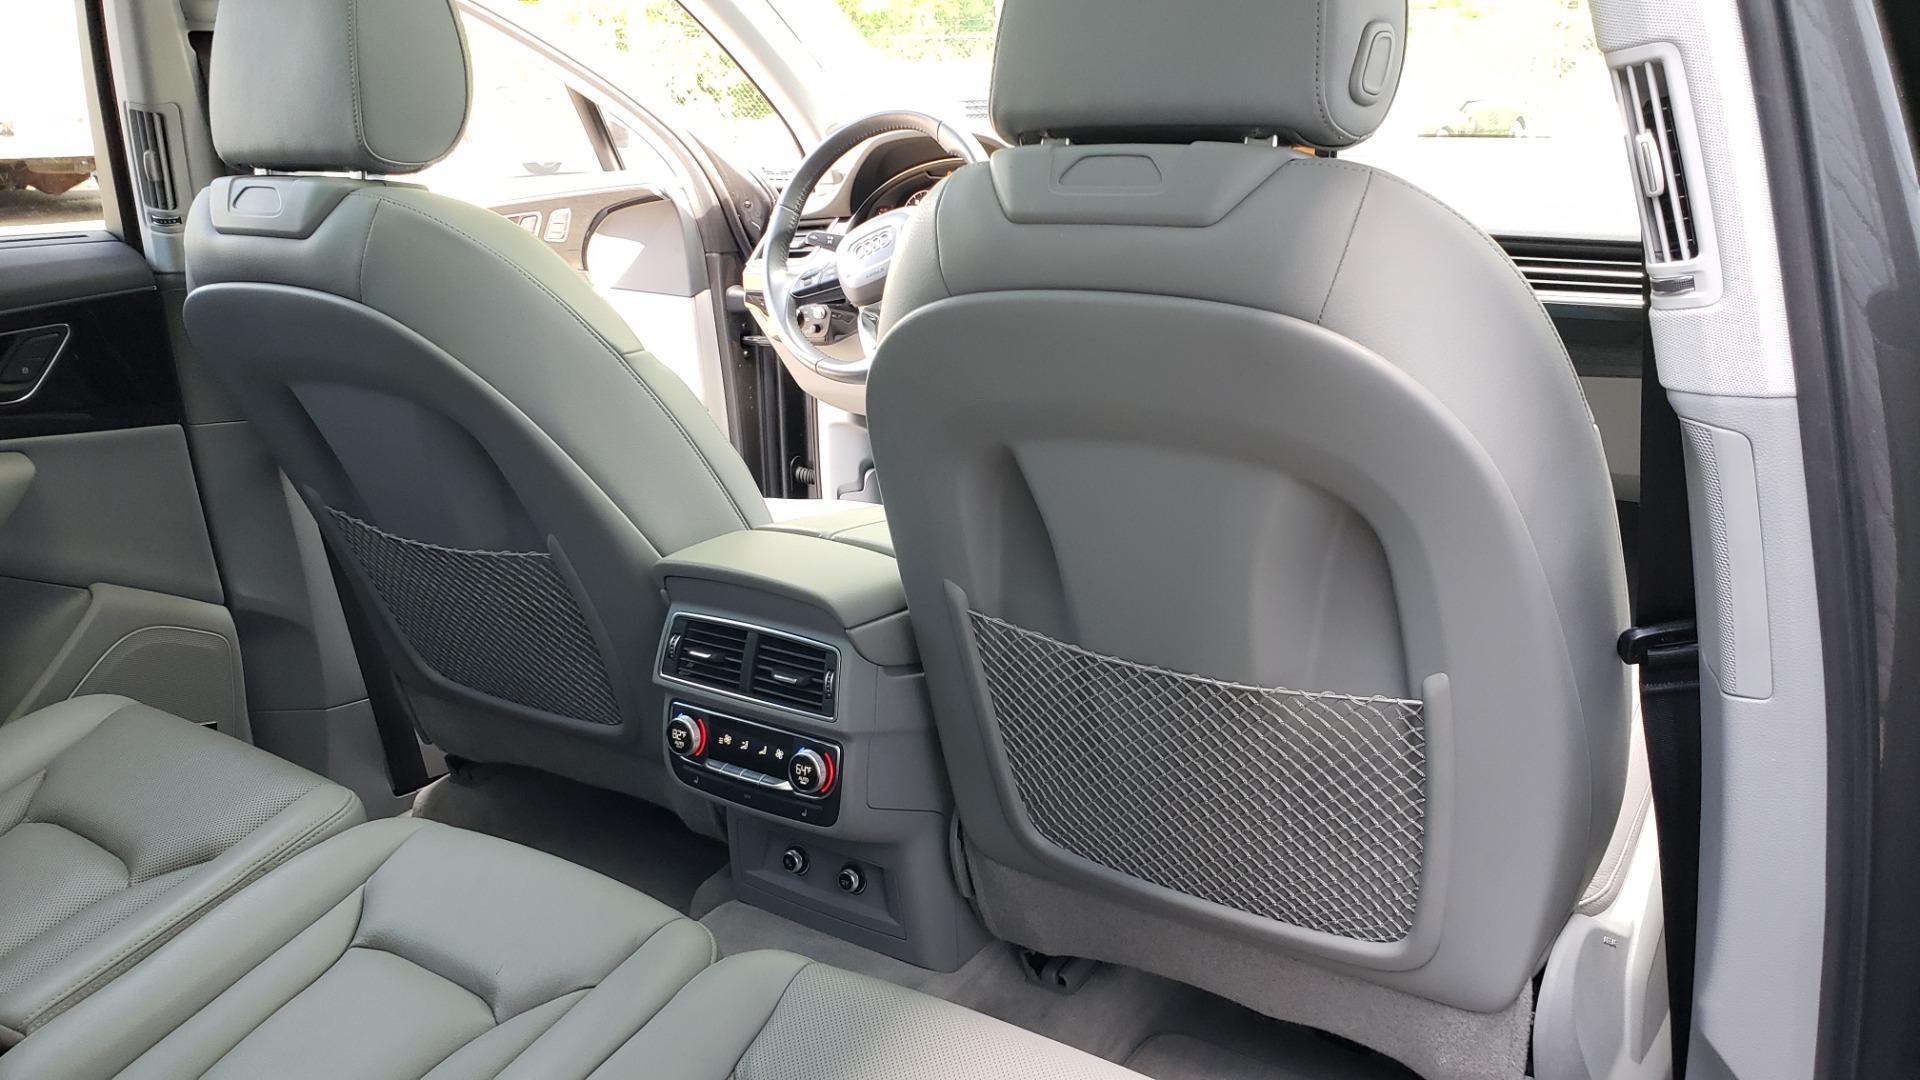 Used 2018 Audi Q7 PRESTIGE TIPTRONIC / NAV / SUNROOF / ADAPTIVE PKG / DRVR ASST / CLD WTHR /  for sale $49,995 at Formula Imports in Charlotte NC 28227 87